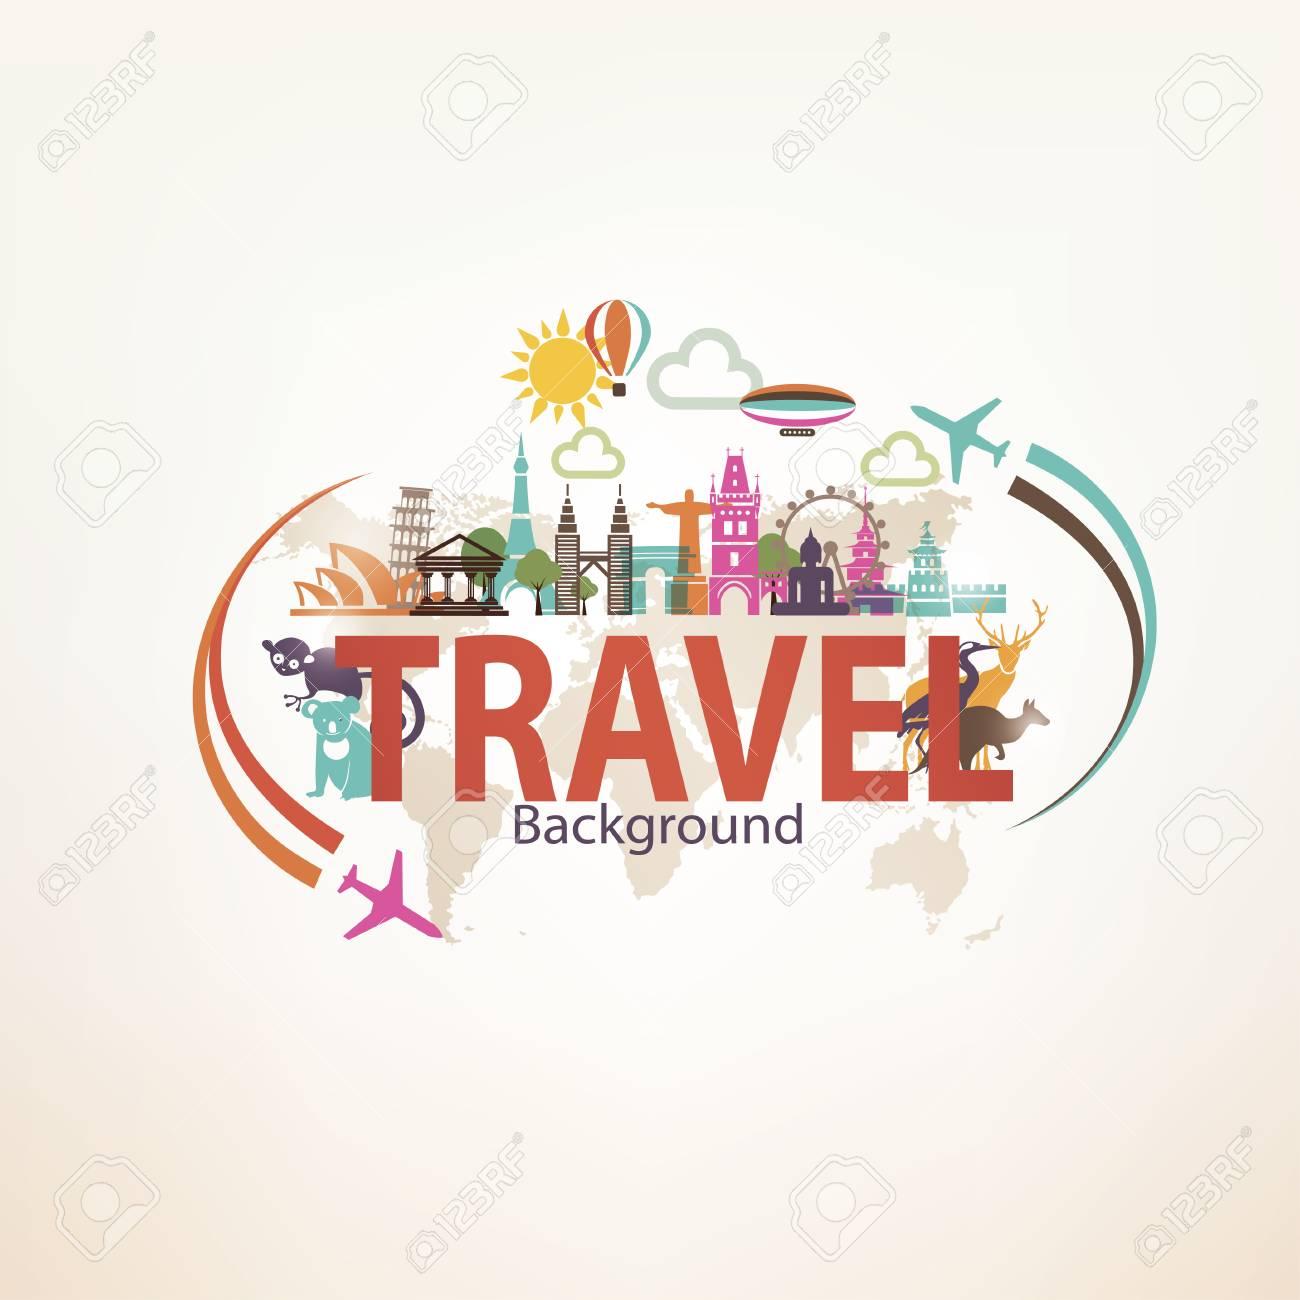 Around The World Travel Background Landmarks And National Symbols 1300x1300